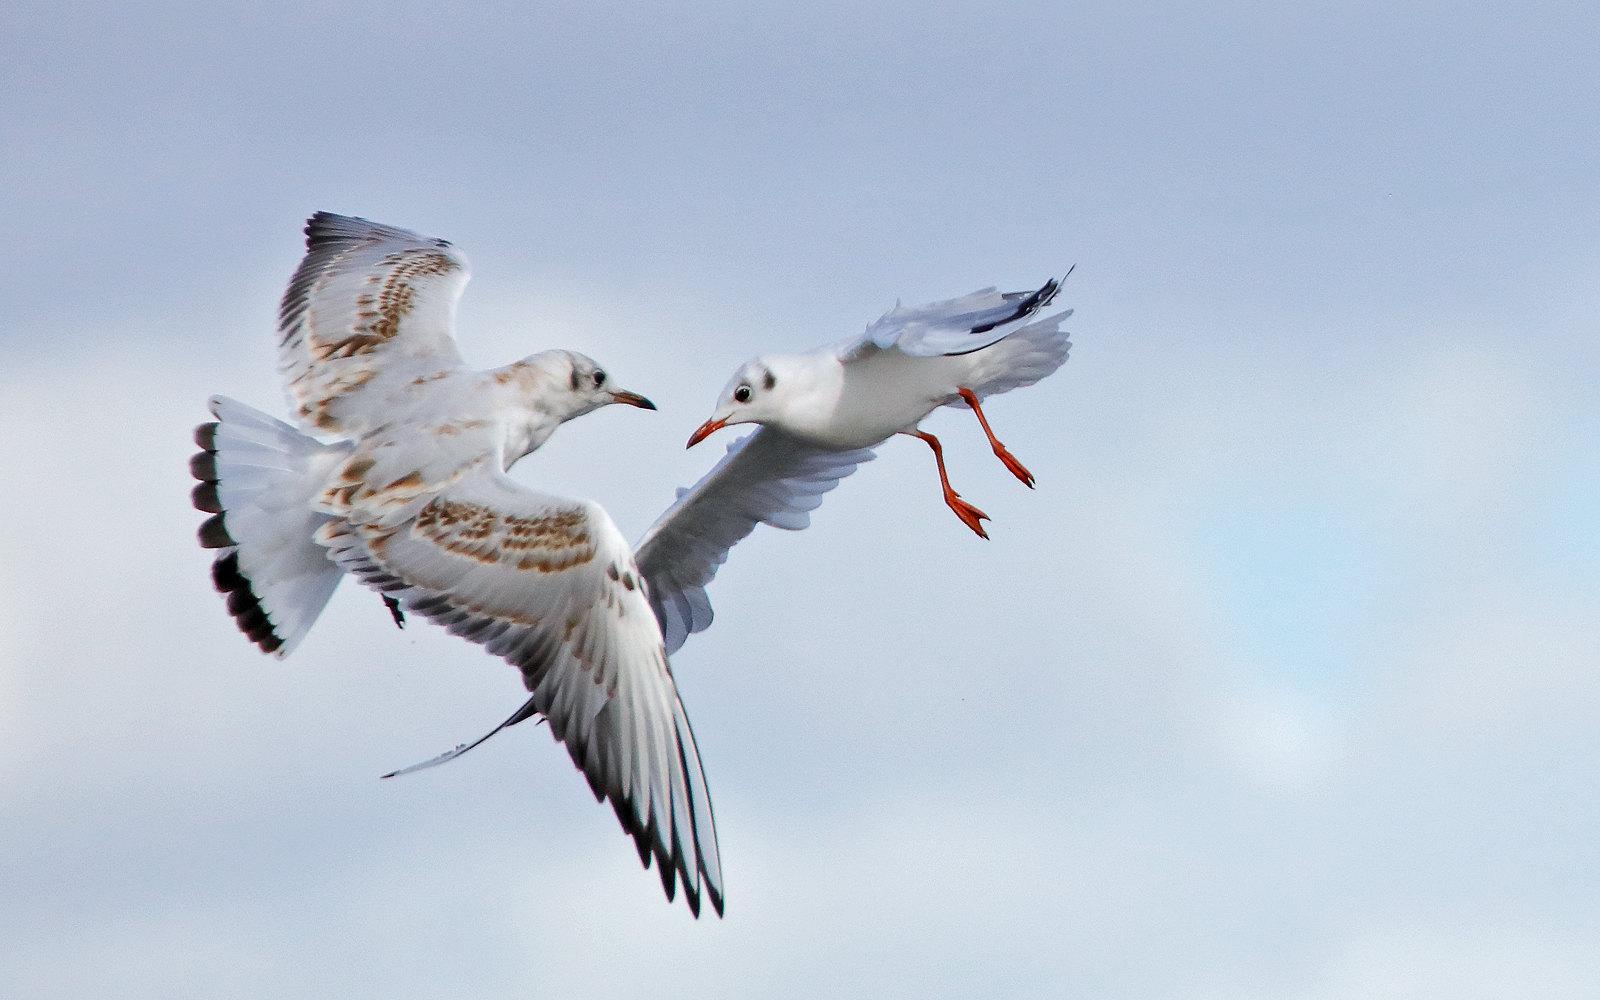 Black-headed Gull - Juvenile & Adult winter